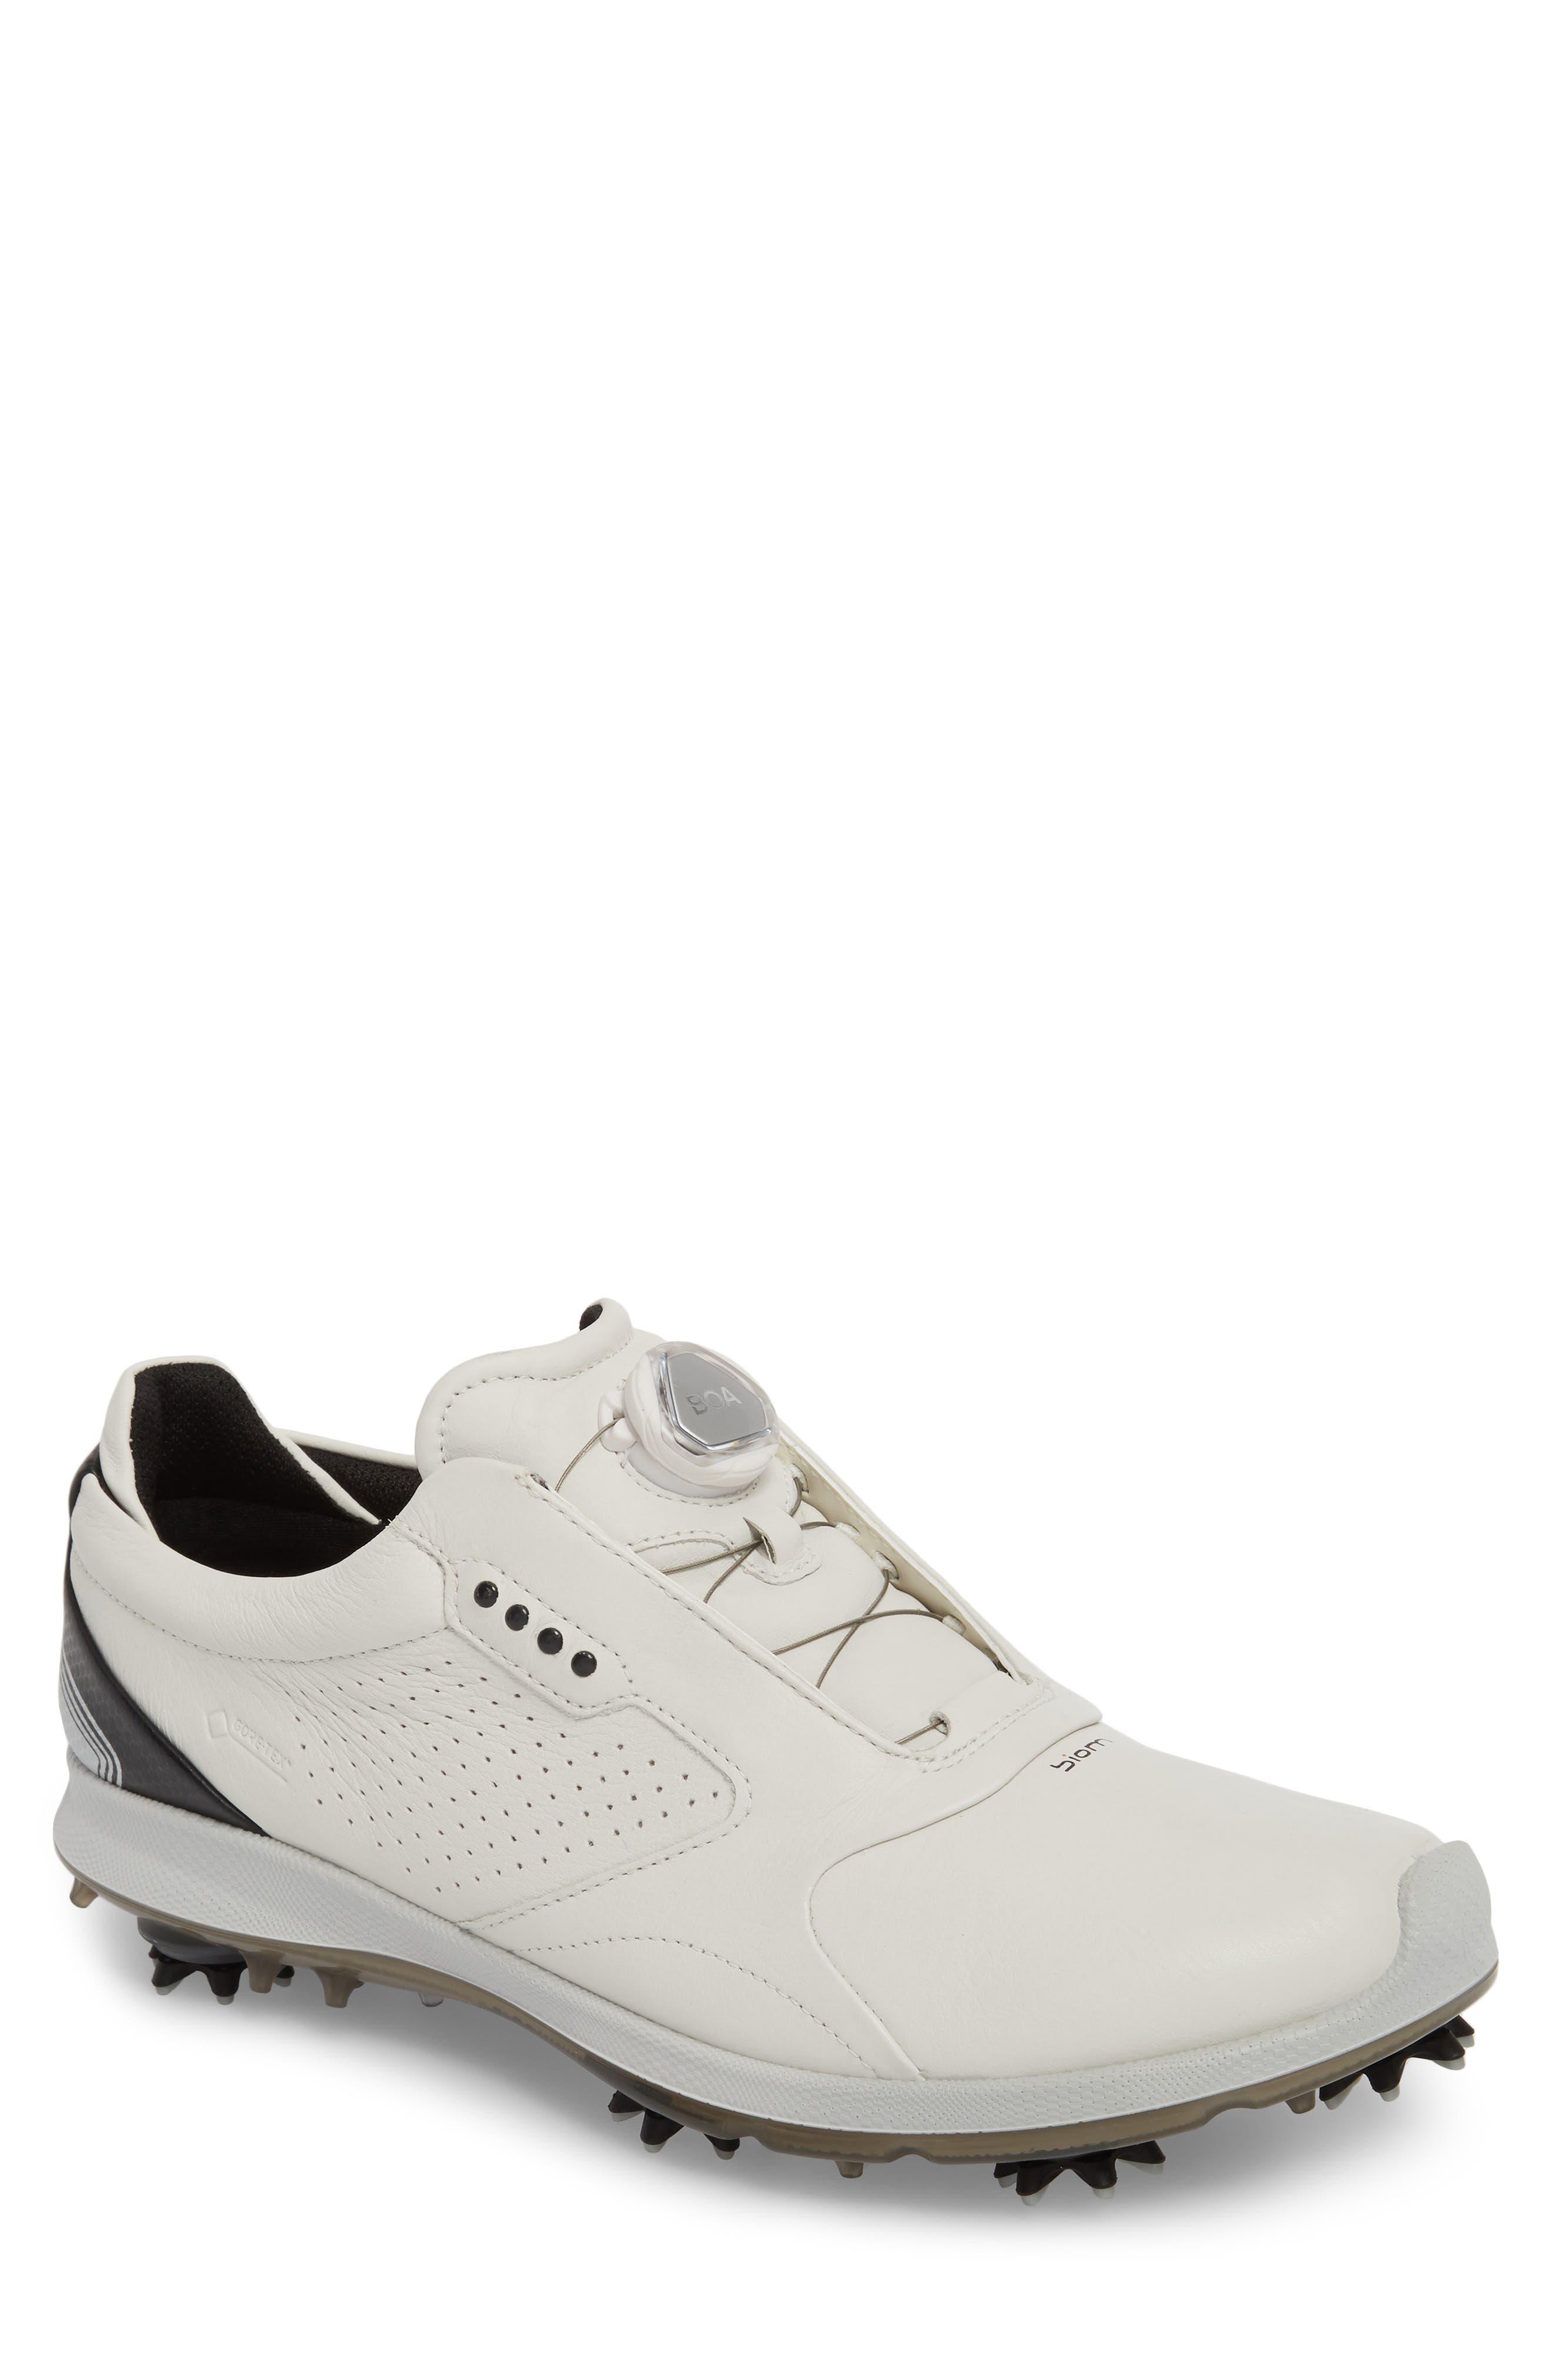 BIOM 2 BOA Gore-Tex<sup>®</sup> Golf Shoe,                         Main,                         color, WHITE/ BLACK LEATHER